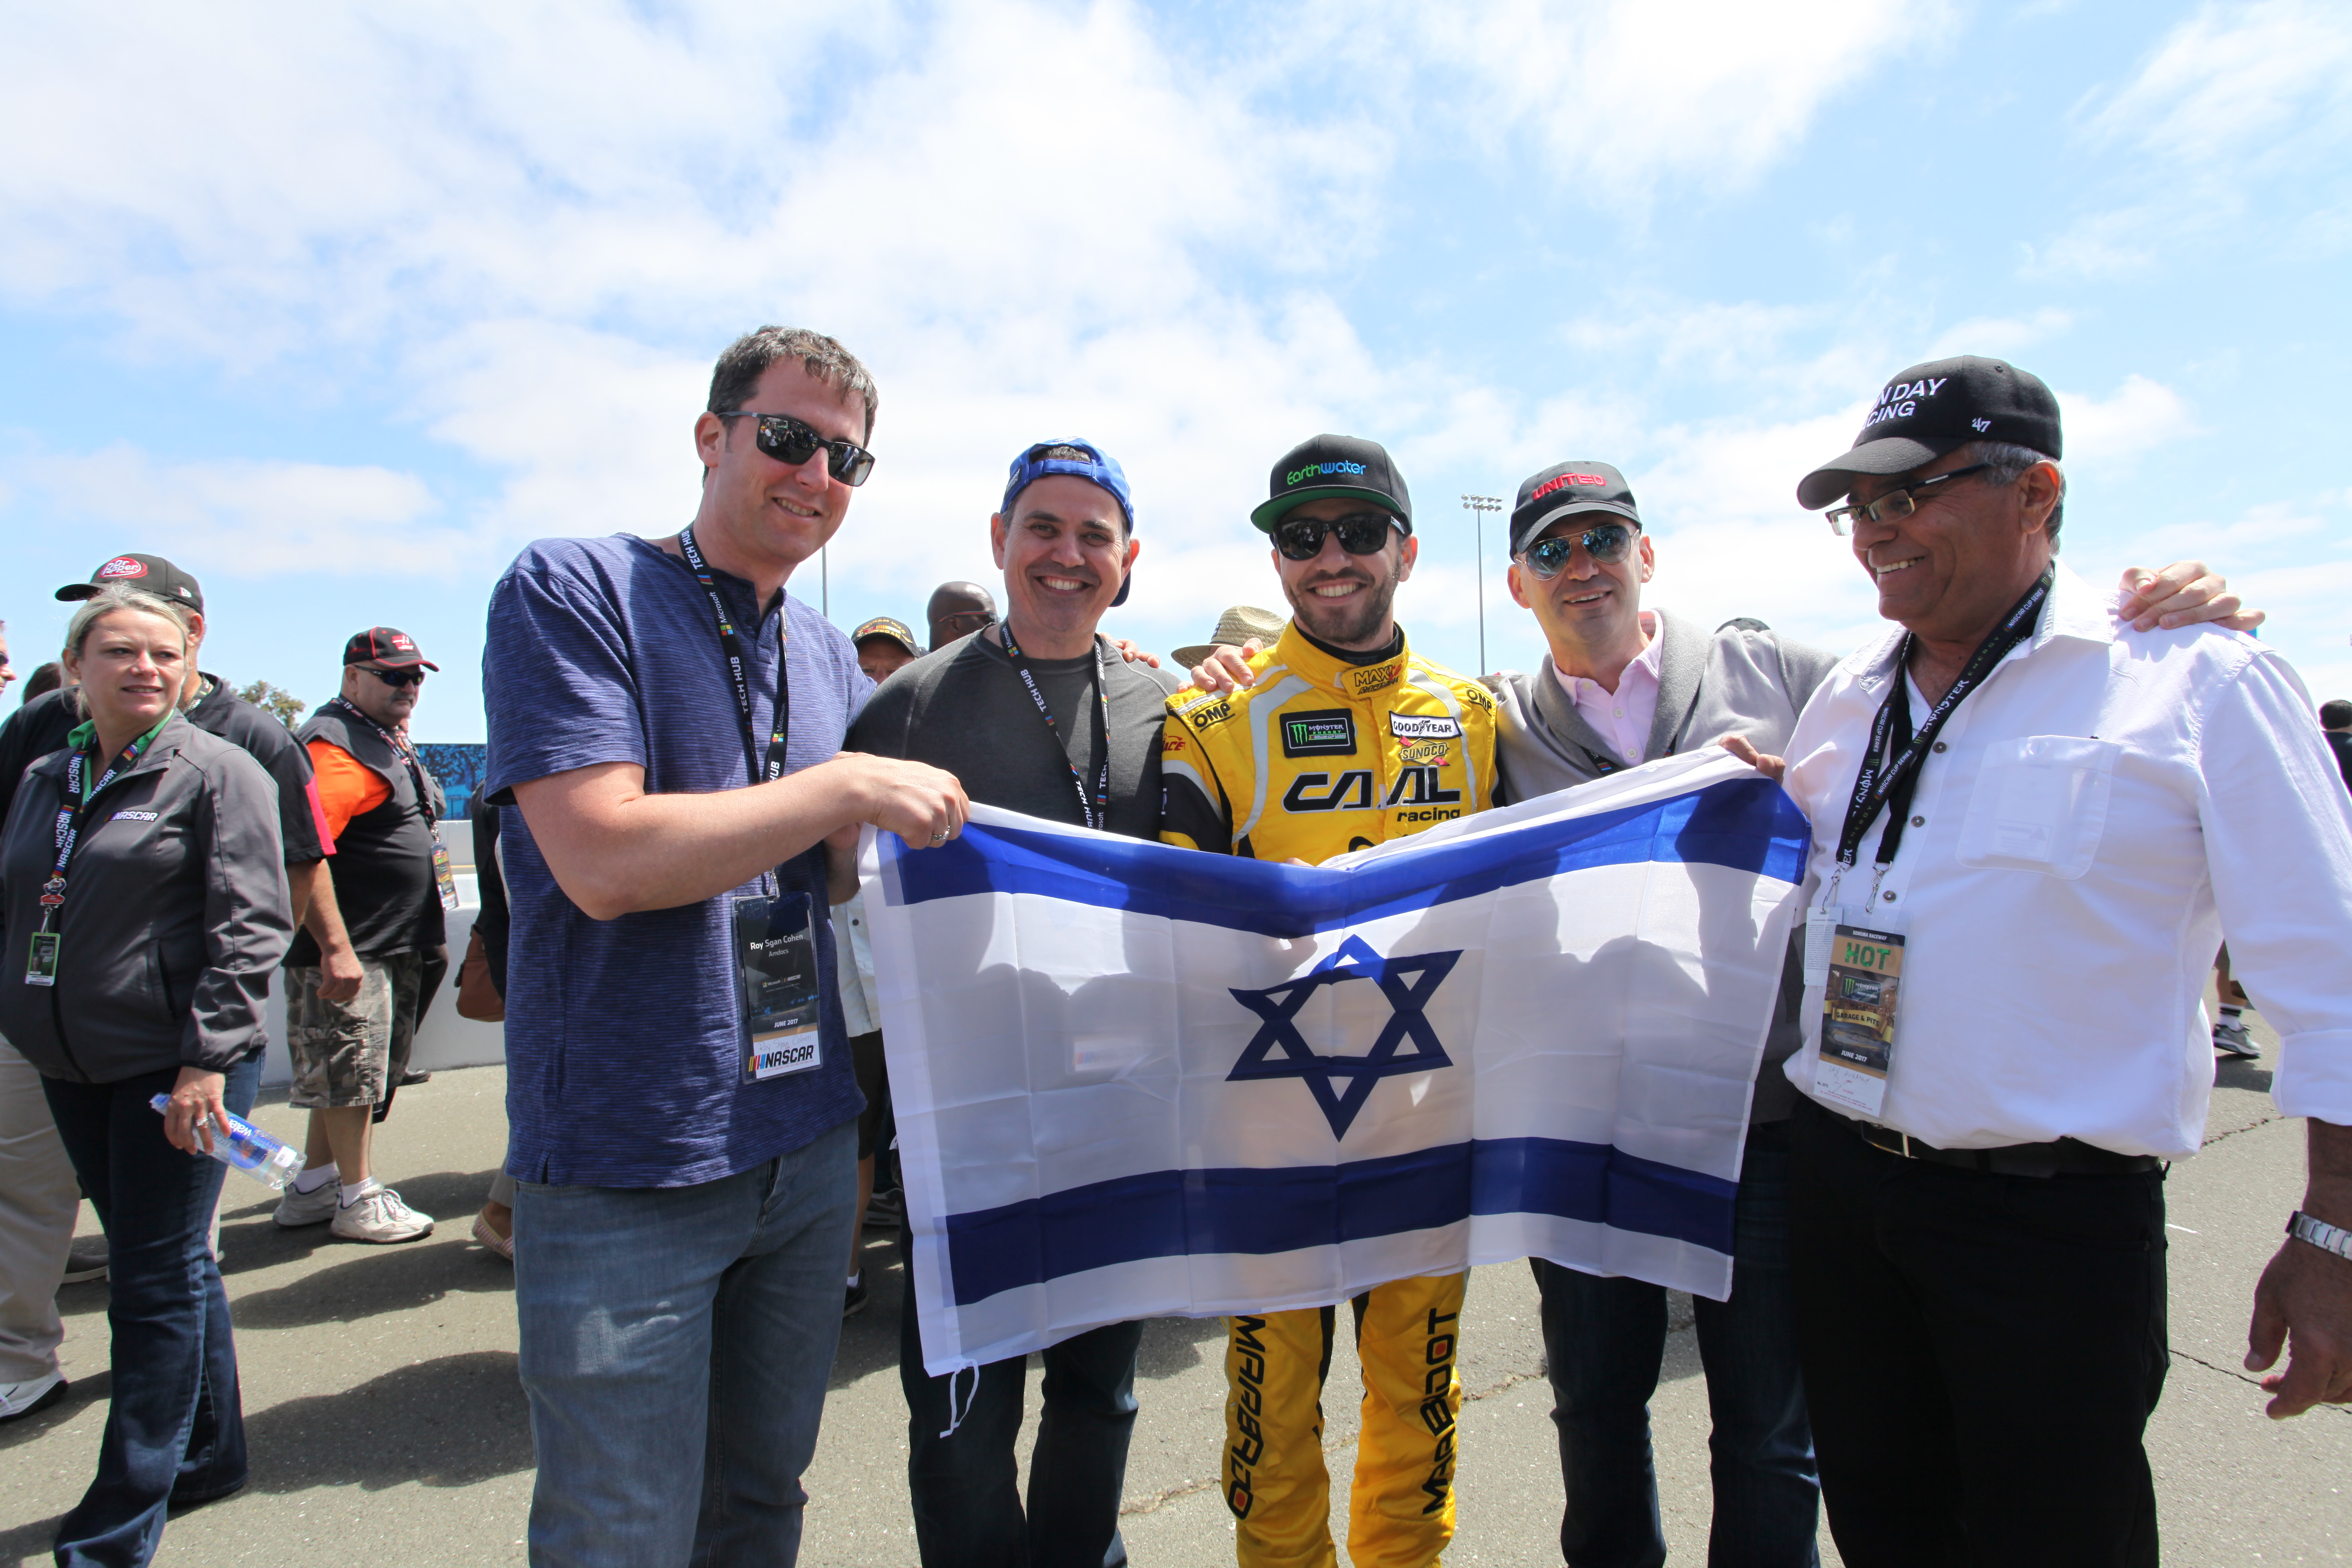 Israeli NASCAR driver Alon Day (center) with (from left) Roy Cohen, Avishai Sharlin, Dan Hod and Avi Day (Alon's dad) at the Sonoma Raceway unfurling an Israeli flag (Photo/Max A. Cherney)